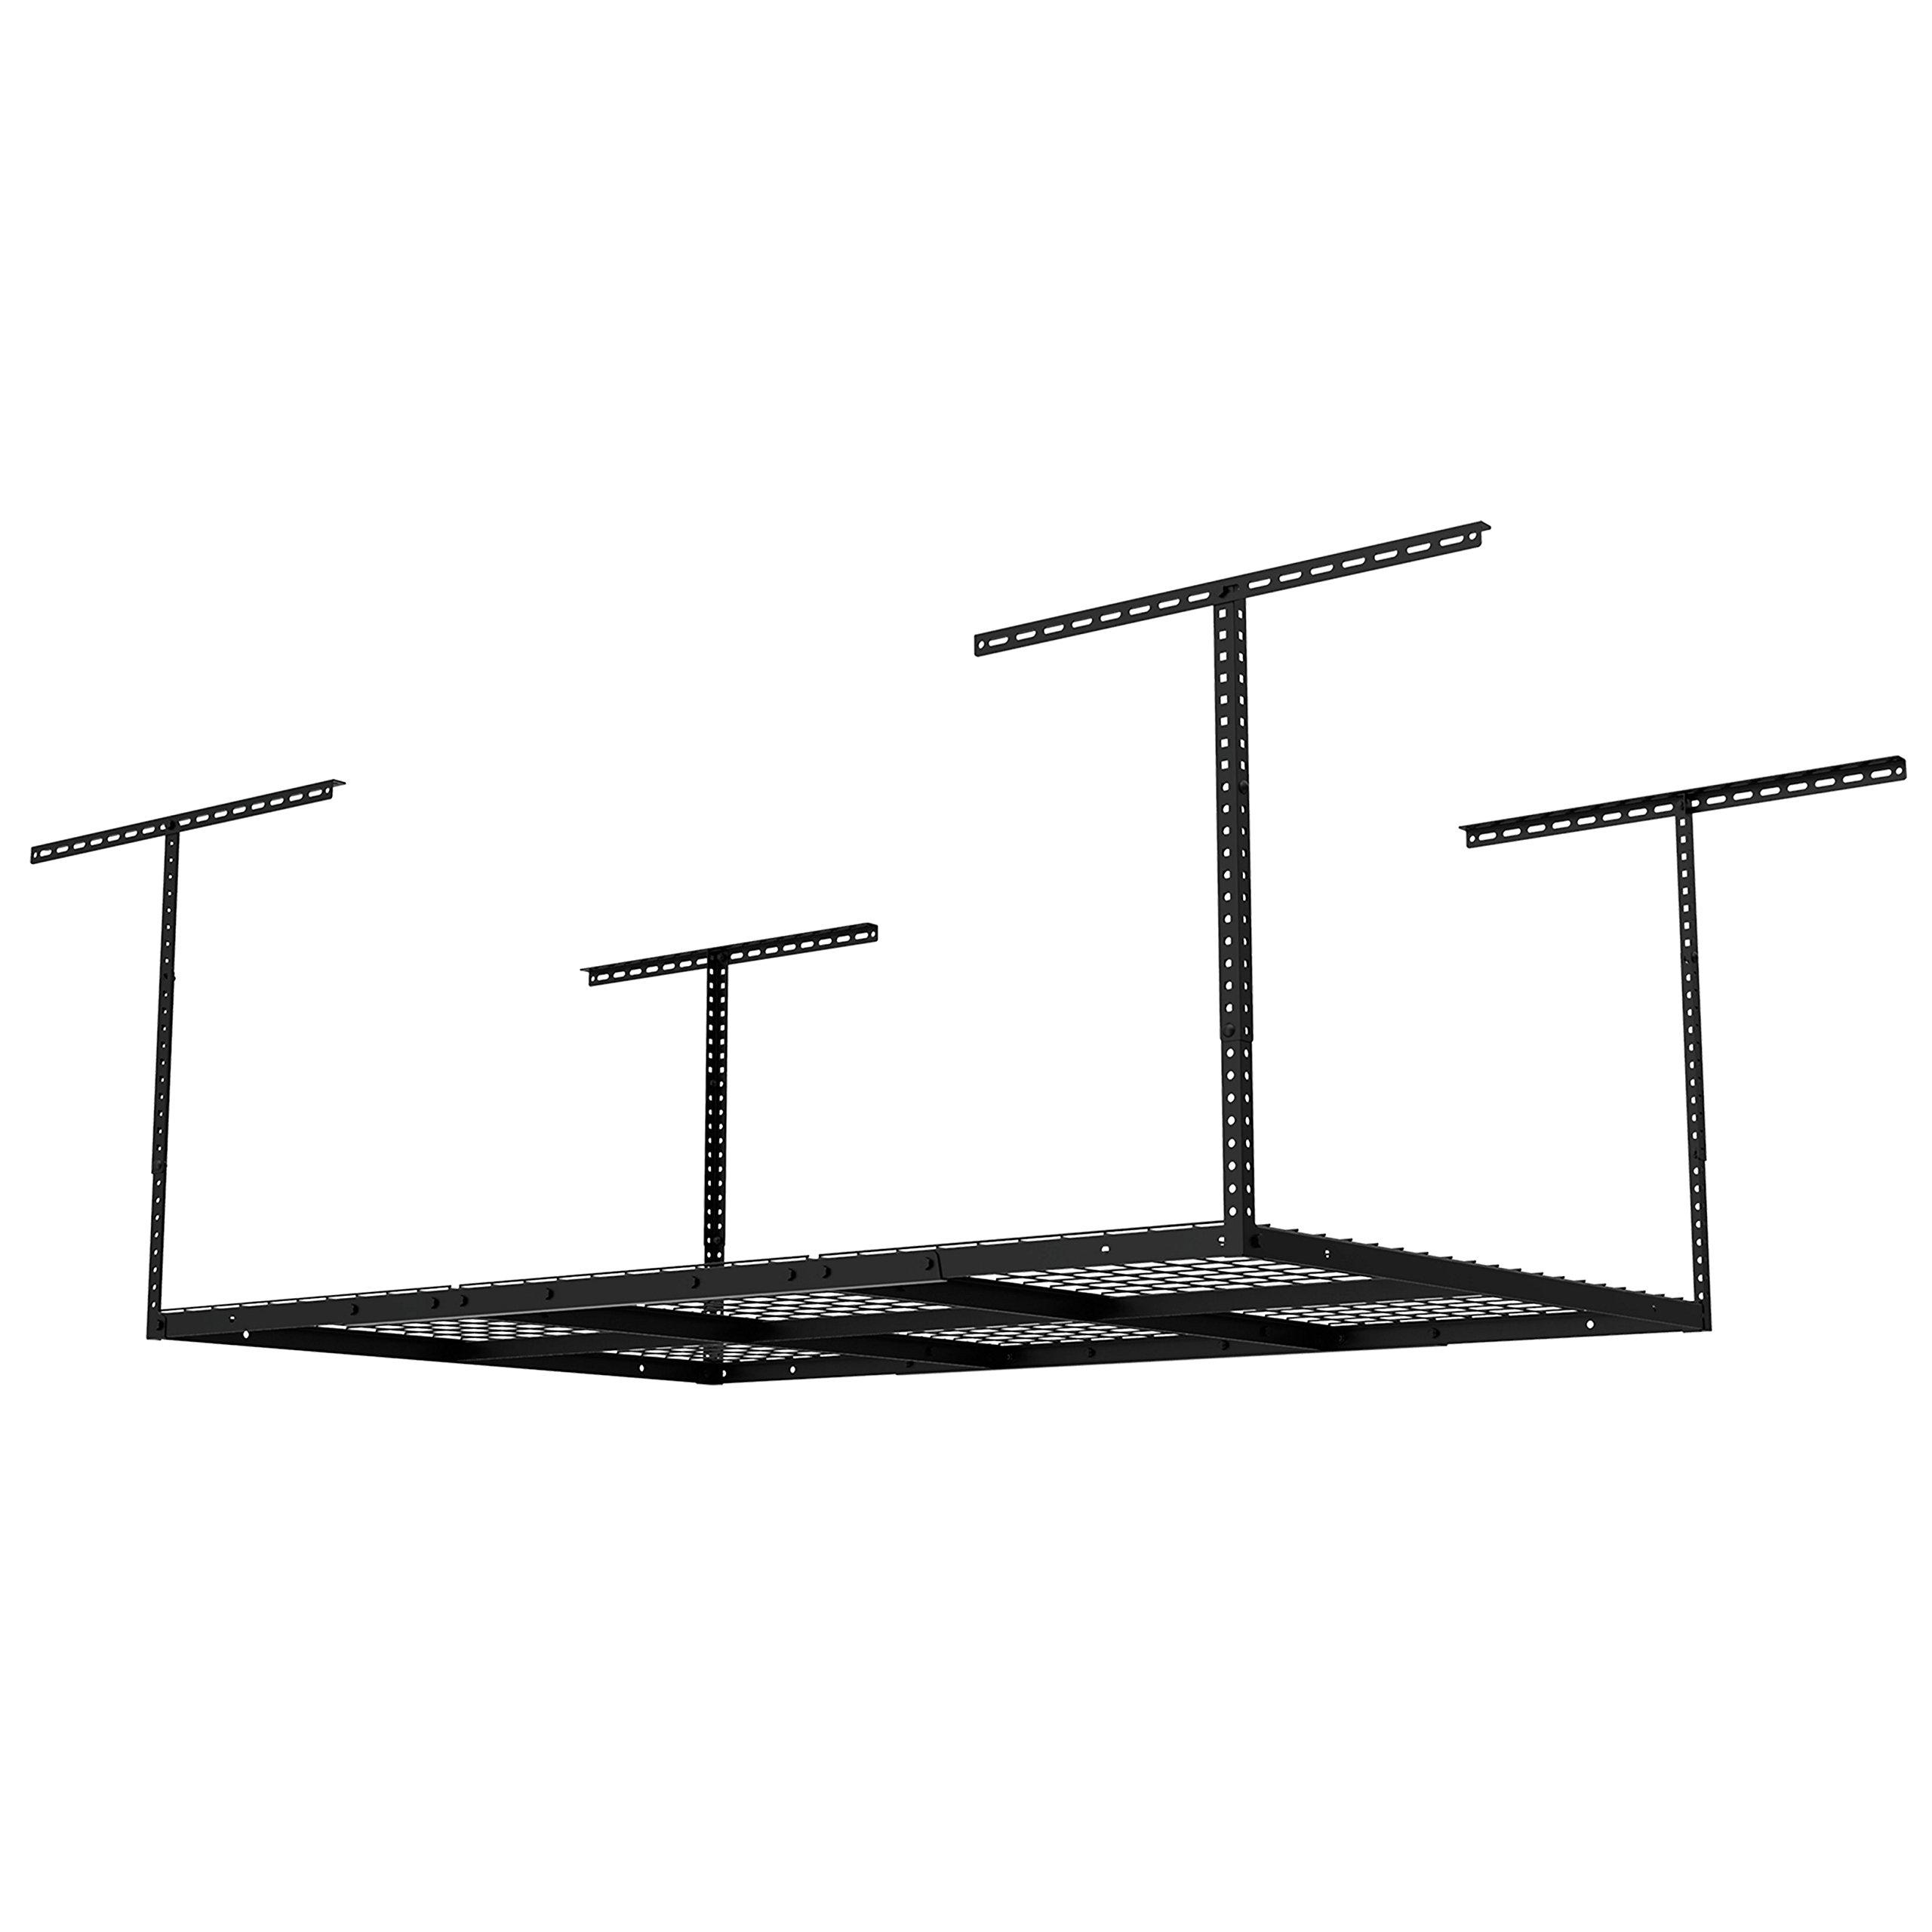 FLEXIMOUNTS 4x6 Heavy Duty Overhead Garage Adjustable Ceiling Storage Rack, 72'' Length x 48'' Width x 40'' Height, Black by FLEXIMOUNTS (Image #7)